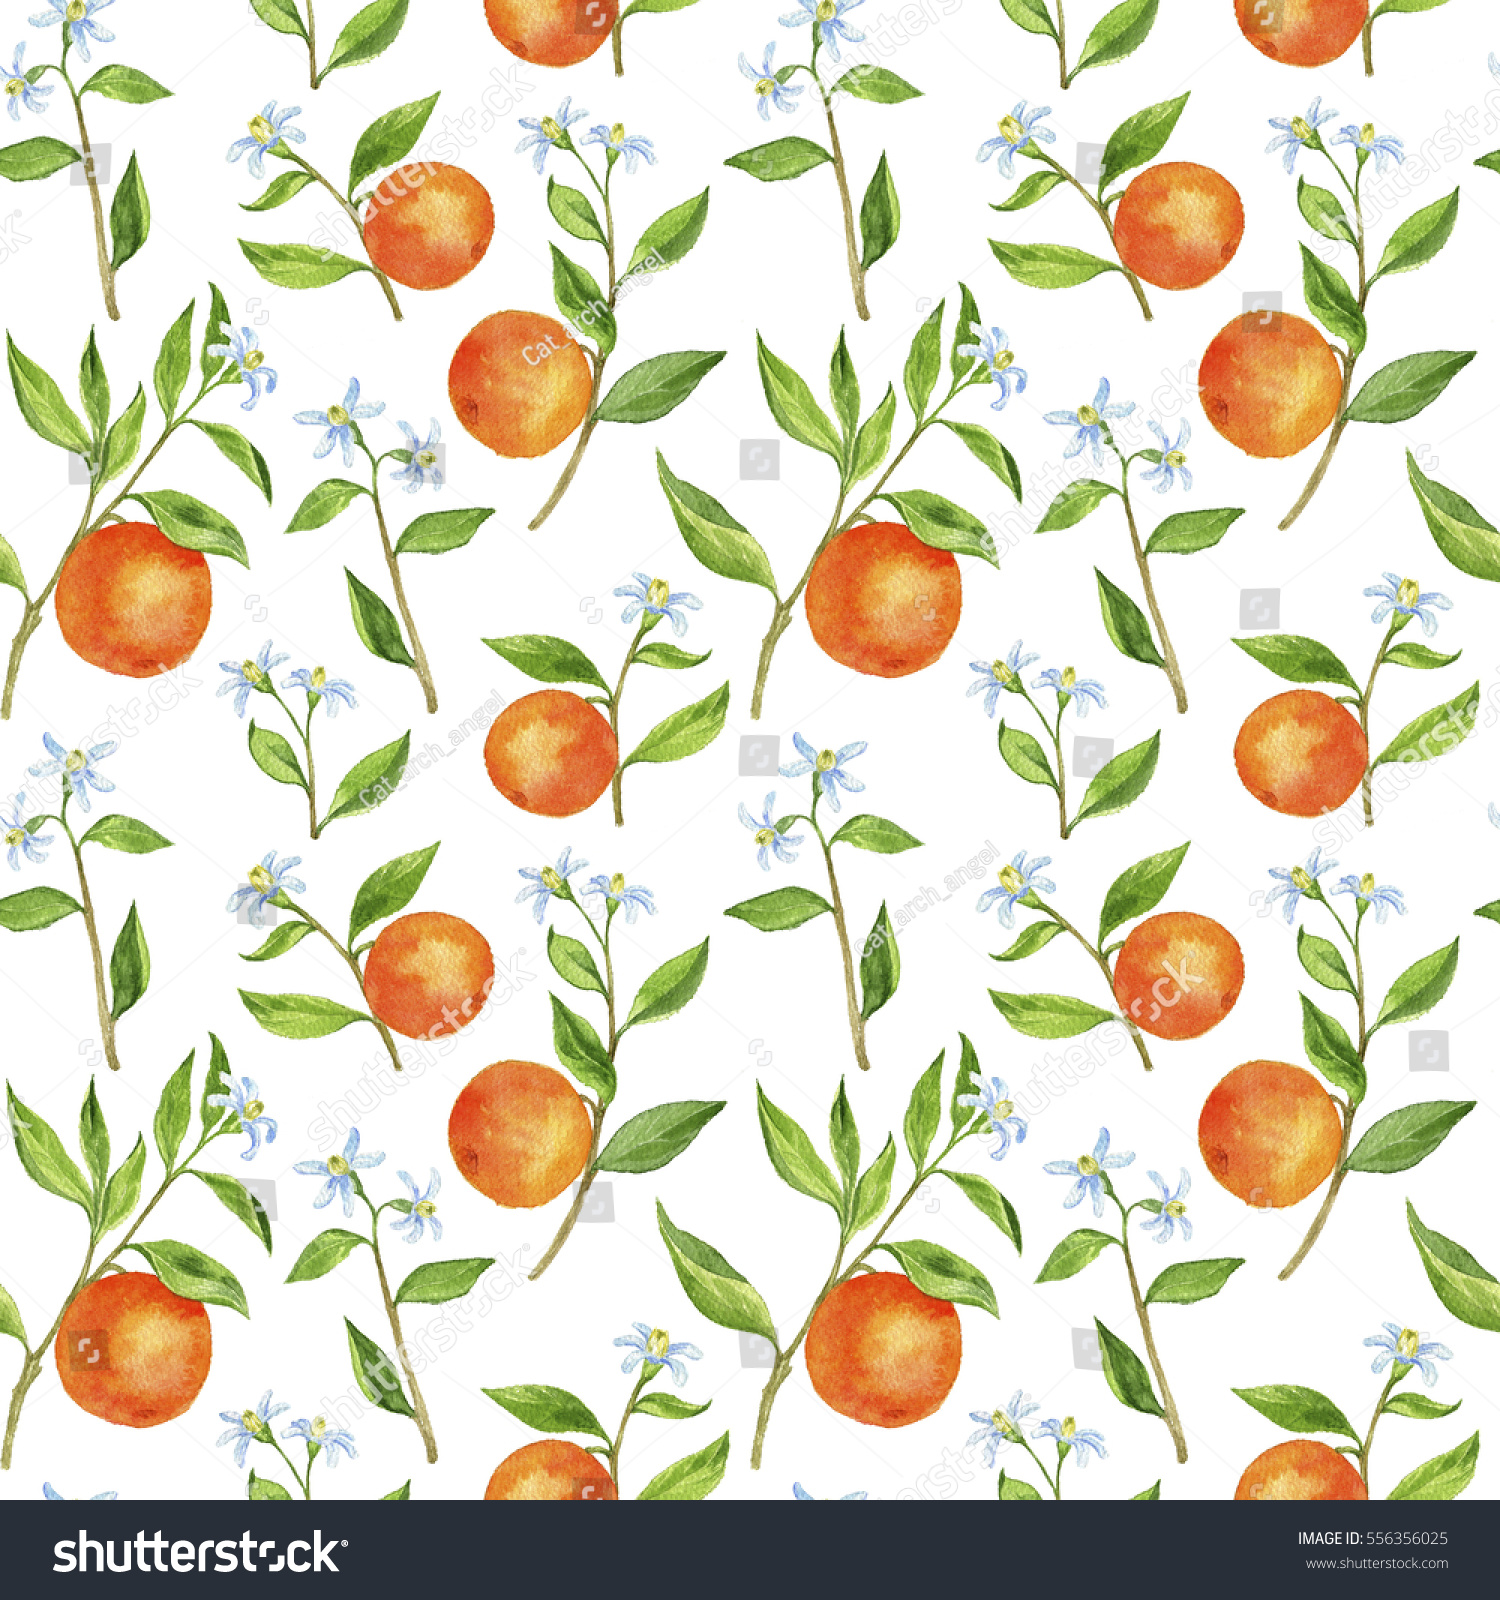 Seamless Pattern Orange Tree Branches Fruits Stock ...